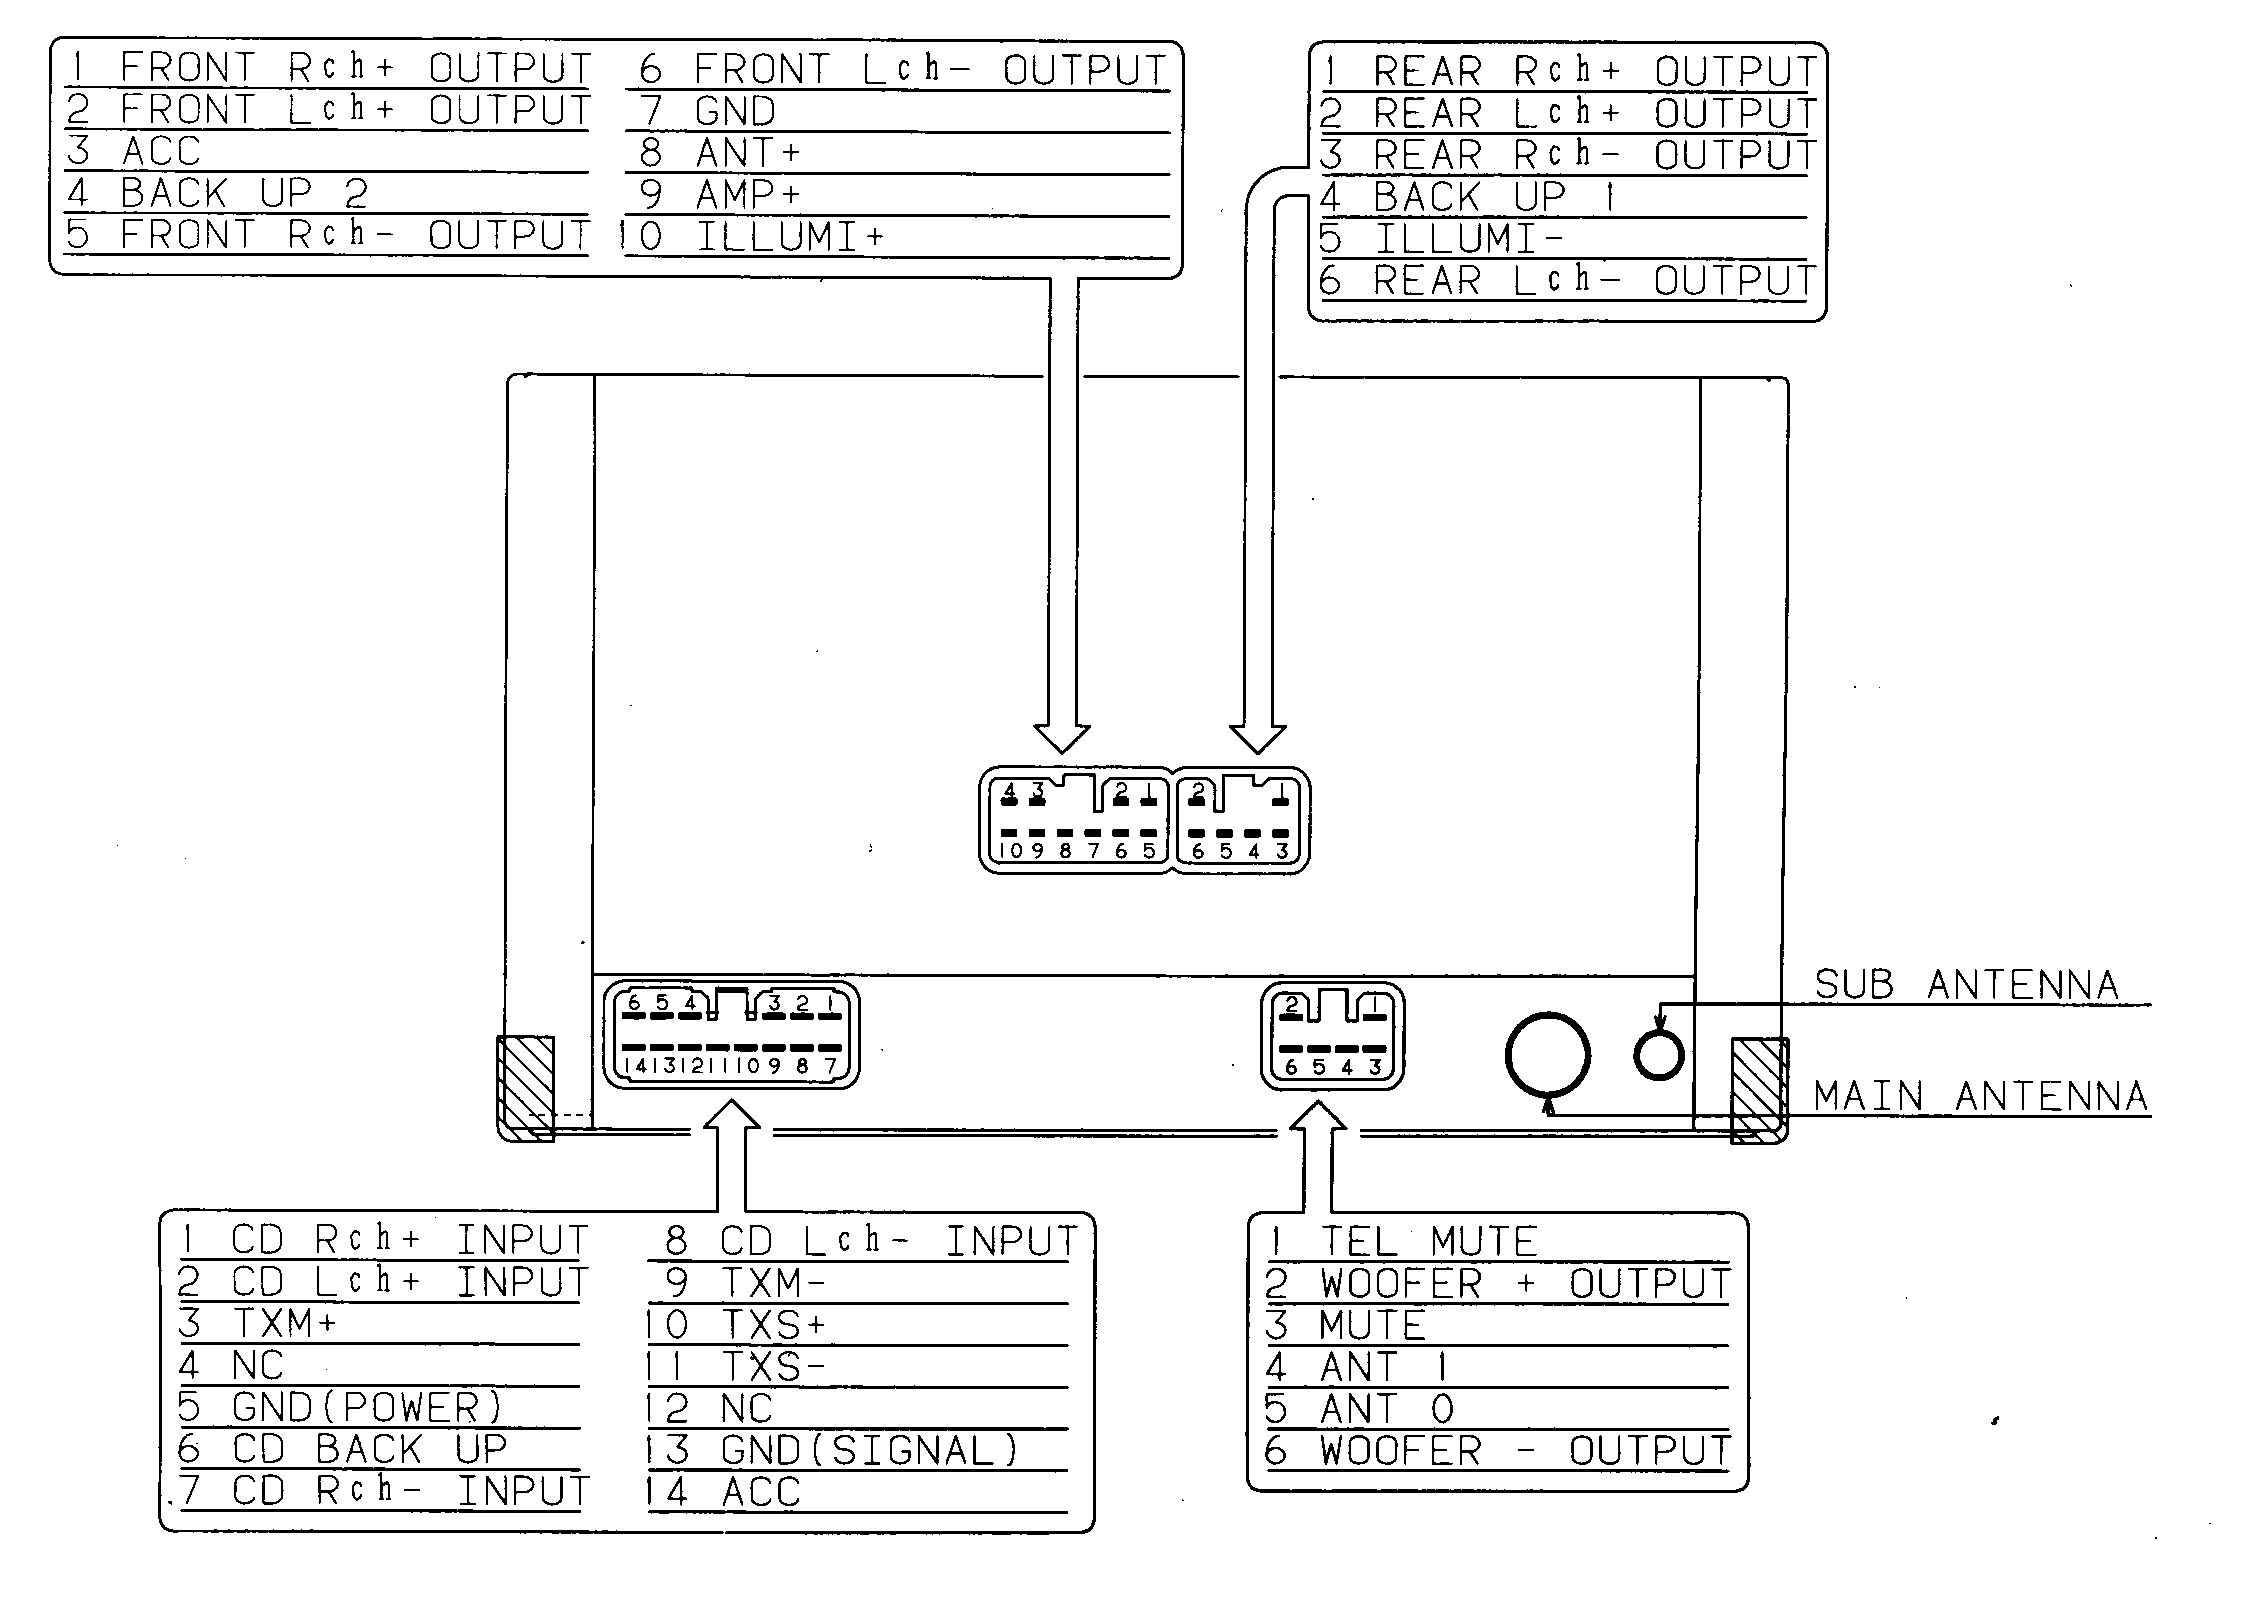 Gmc Envoy Fuse Box Wiring Library 2005 C5500 Diagram 2002 Chevy Trailblazer 5 3